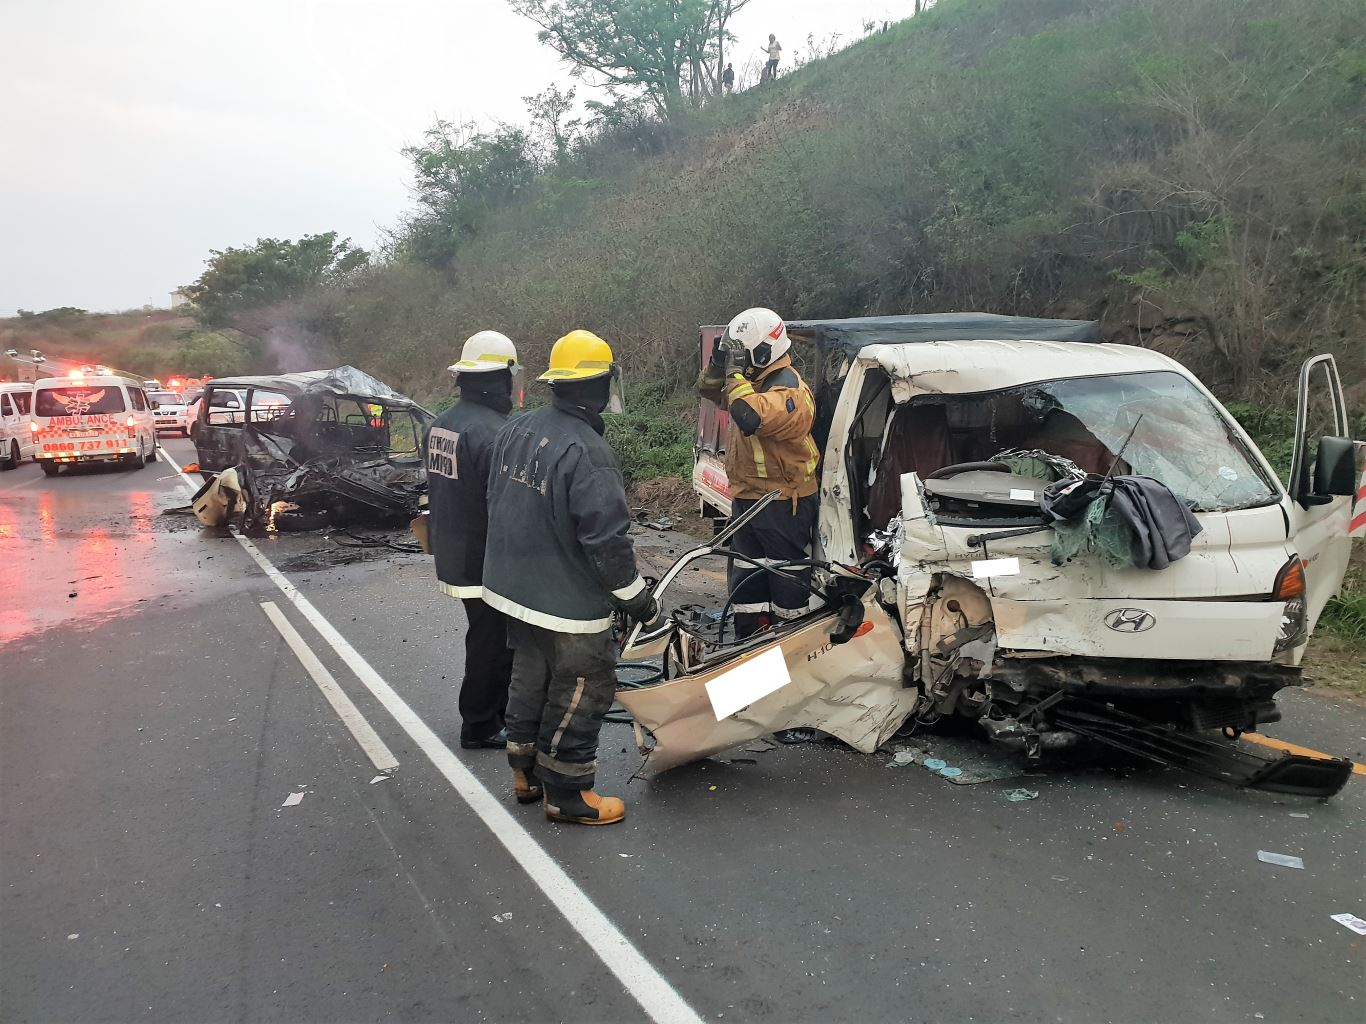 1 Killed 4 injured in head-on crash on the M1 Higginson Highway